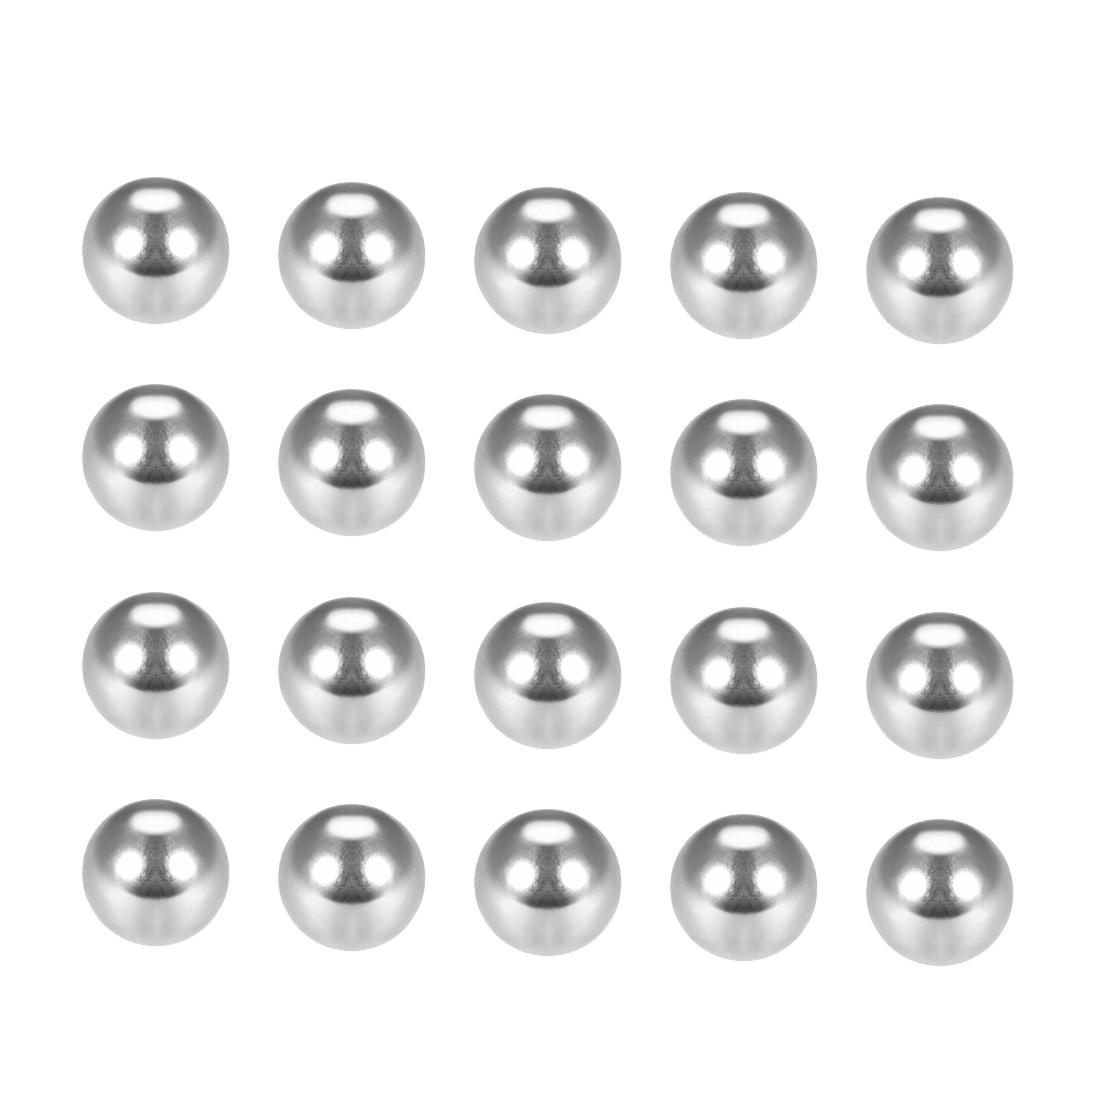 5/32 Inch Precision Chrome Steel Bearing Balls G25 100pcs